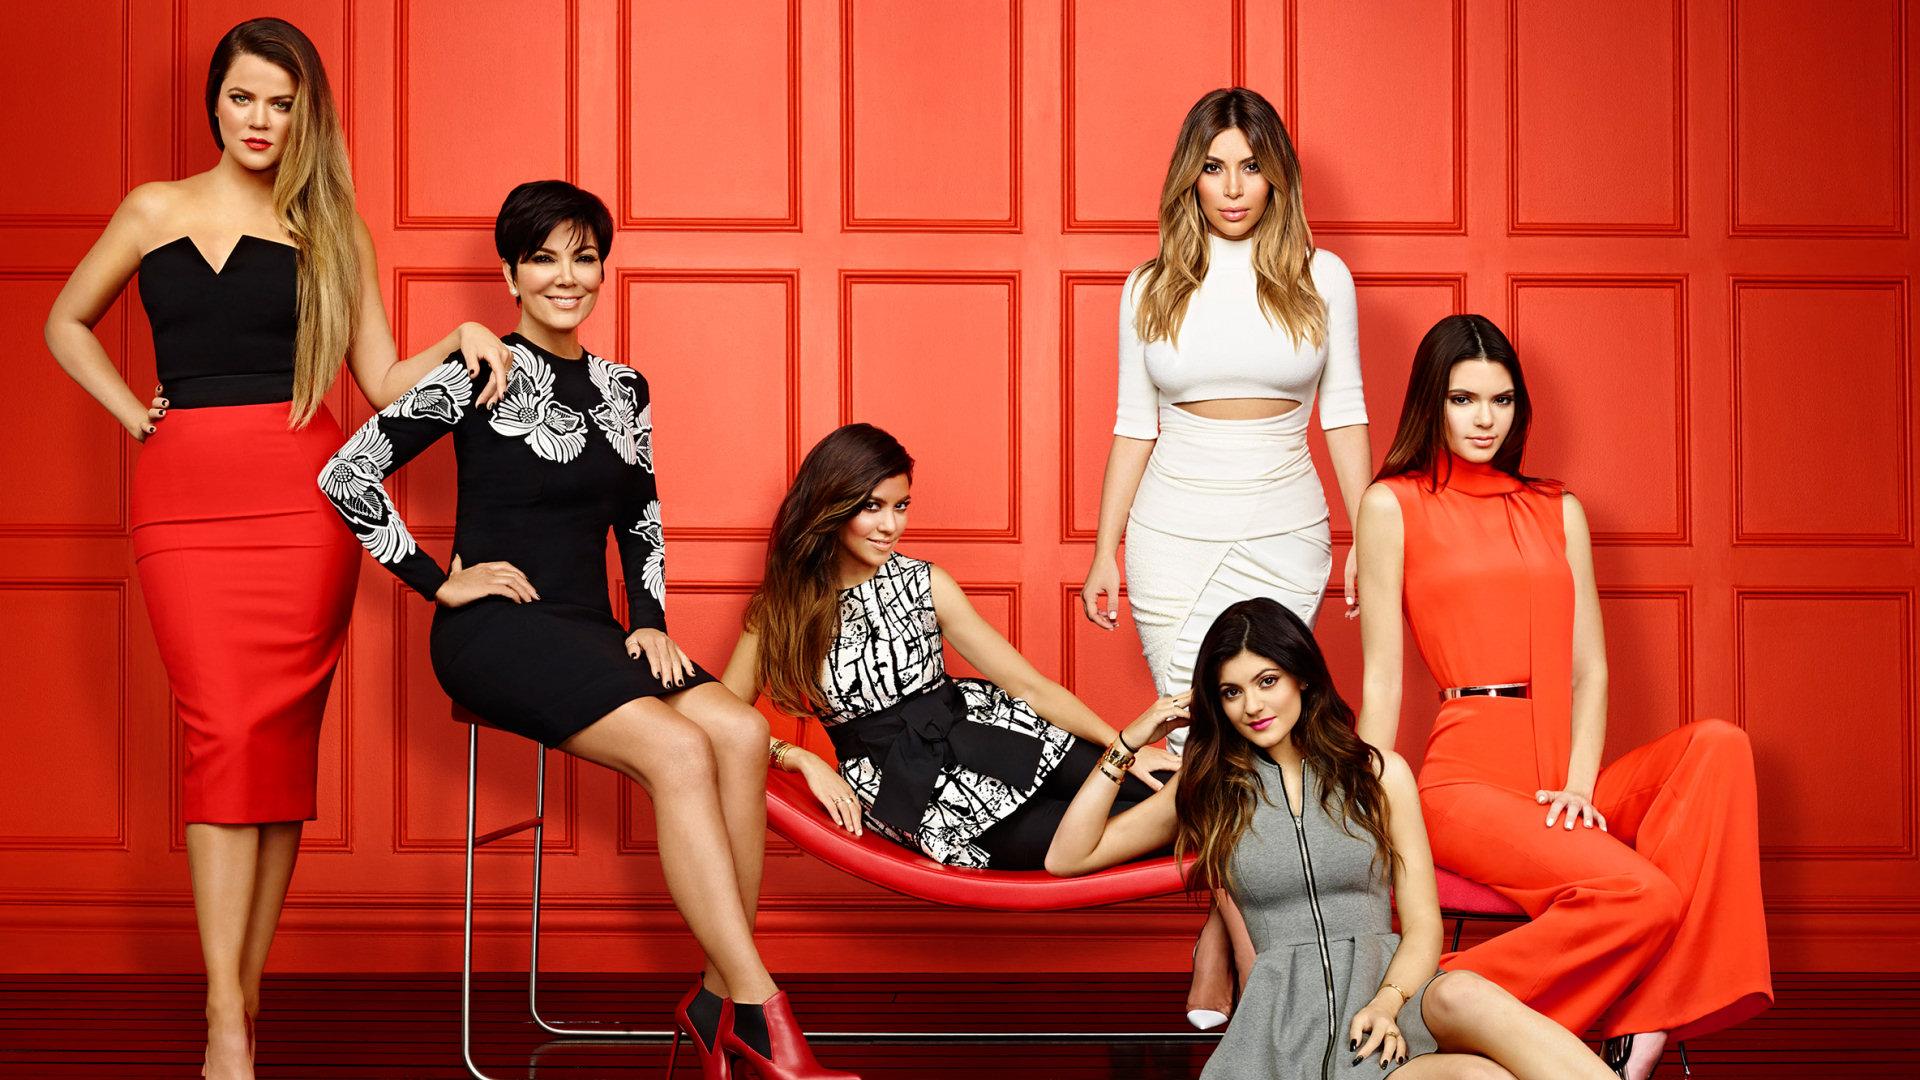 Las Kardashian valen 100 mdd